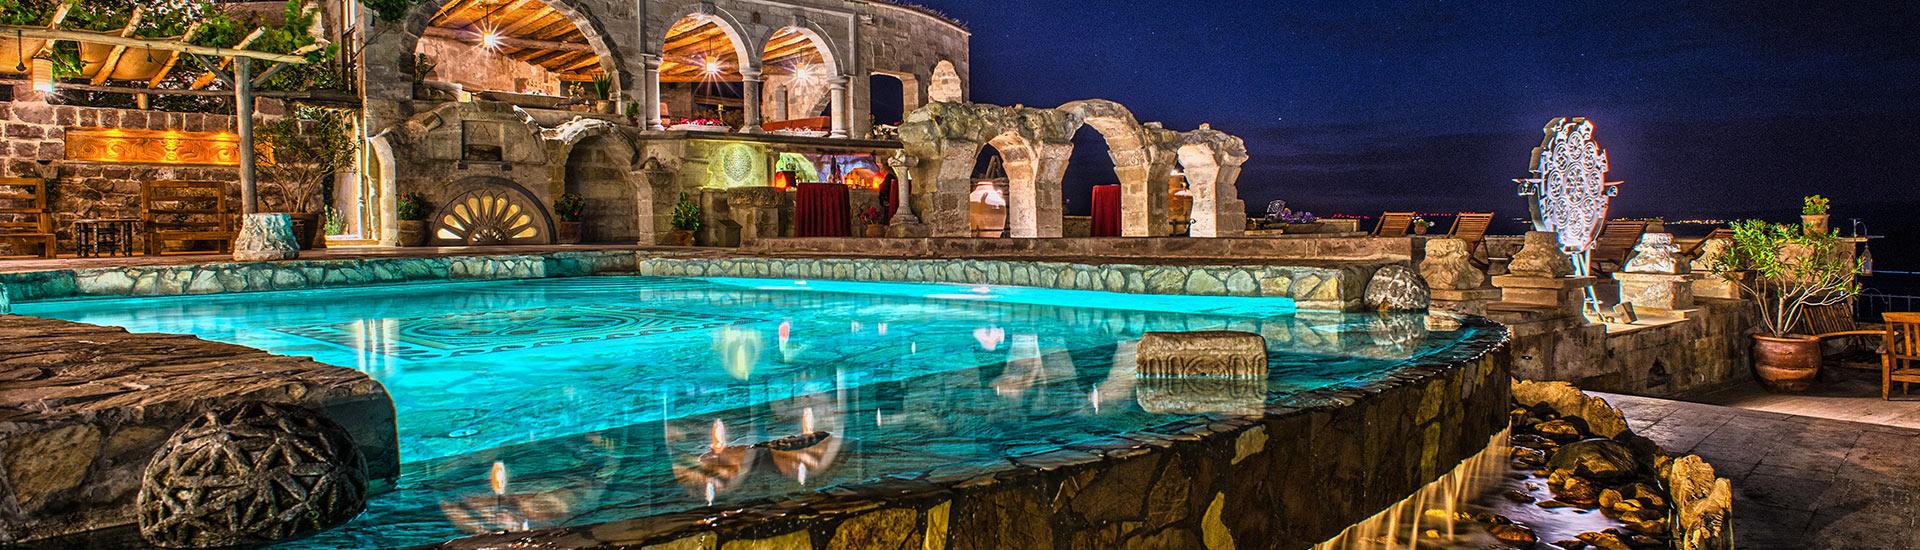 museumhotelcappadocia-relais-chateaux